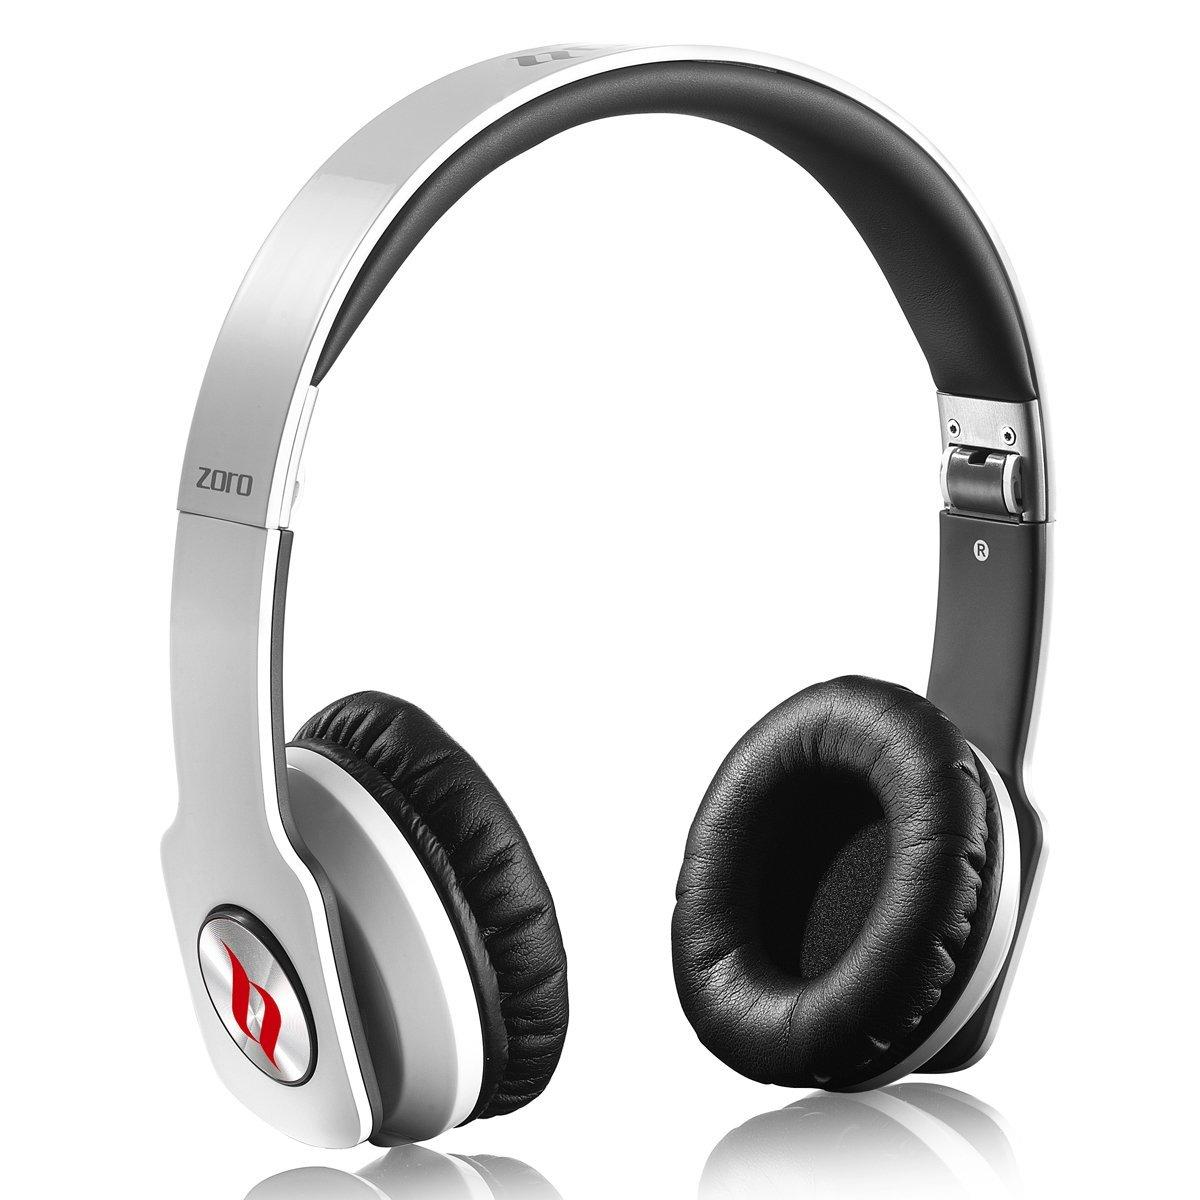 Amazon: Audífonos Noontec Zoro a $439